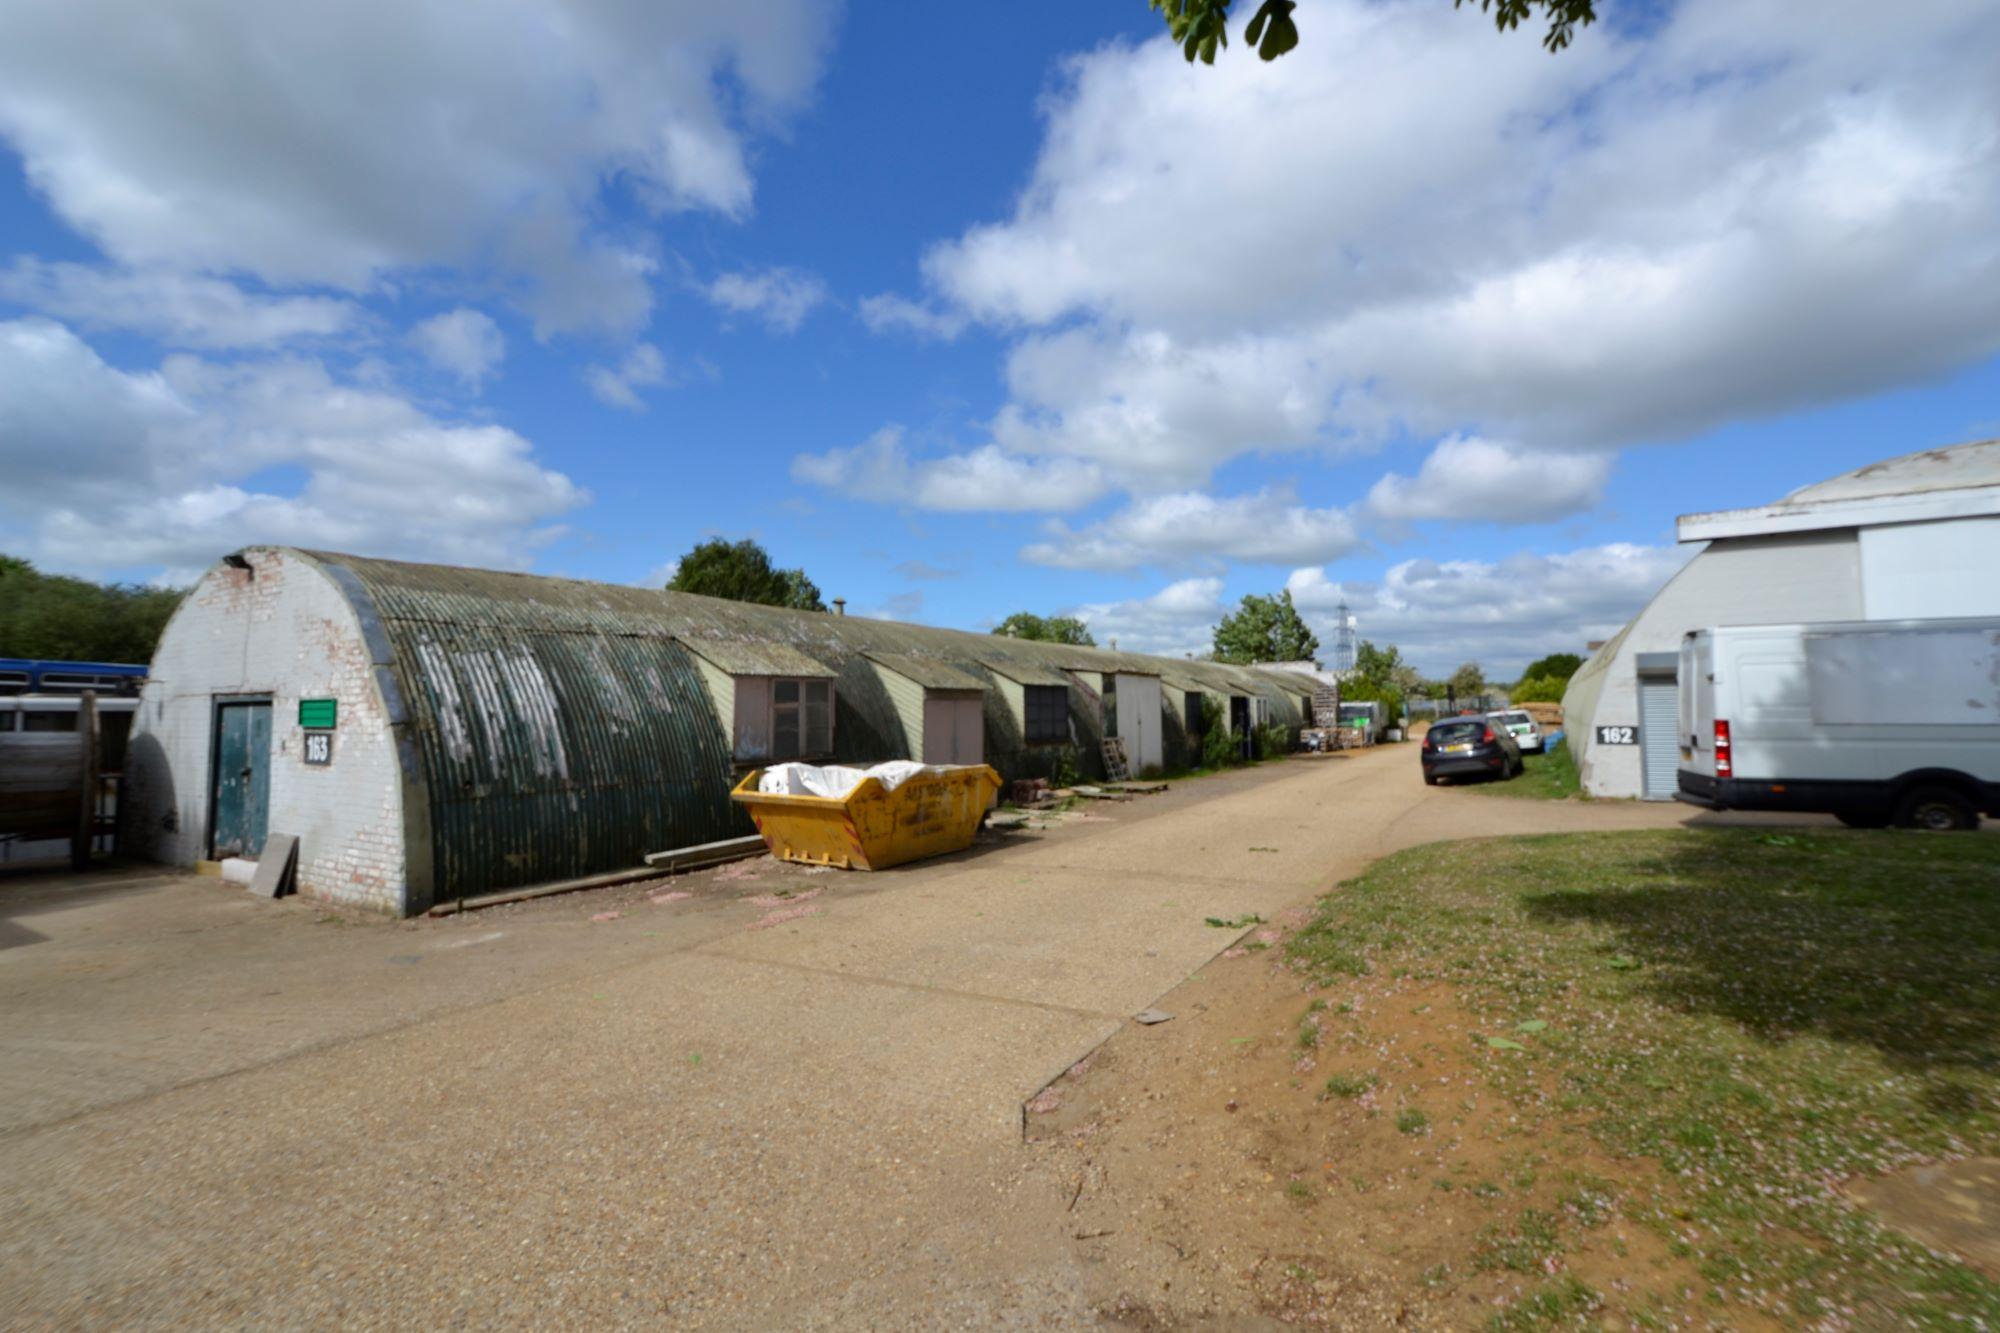 Culham, Oxfordshire, OX14 3BT